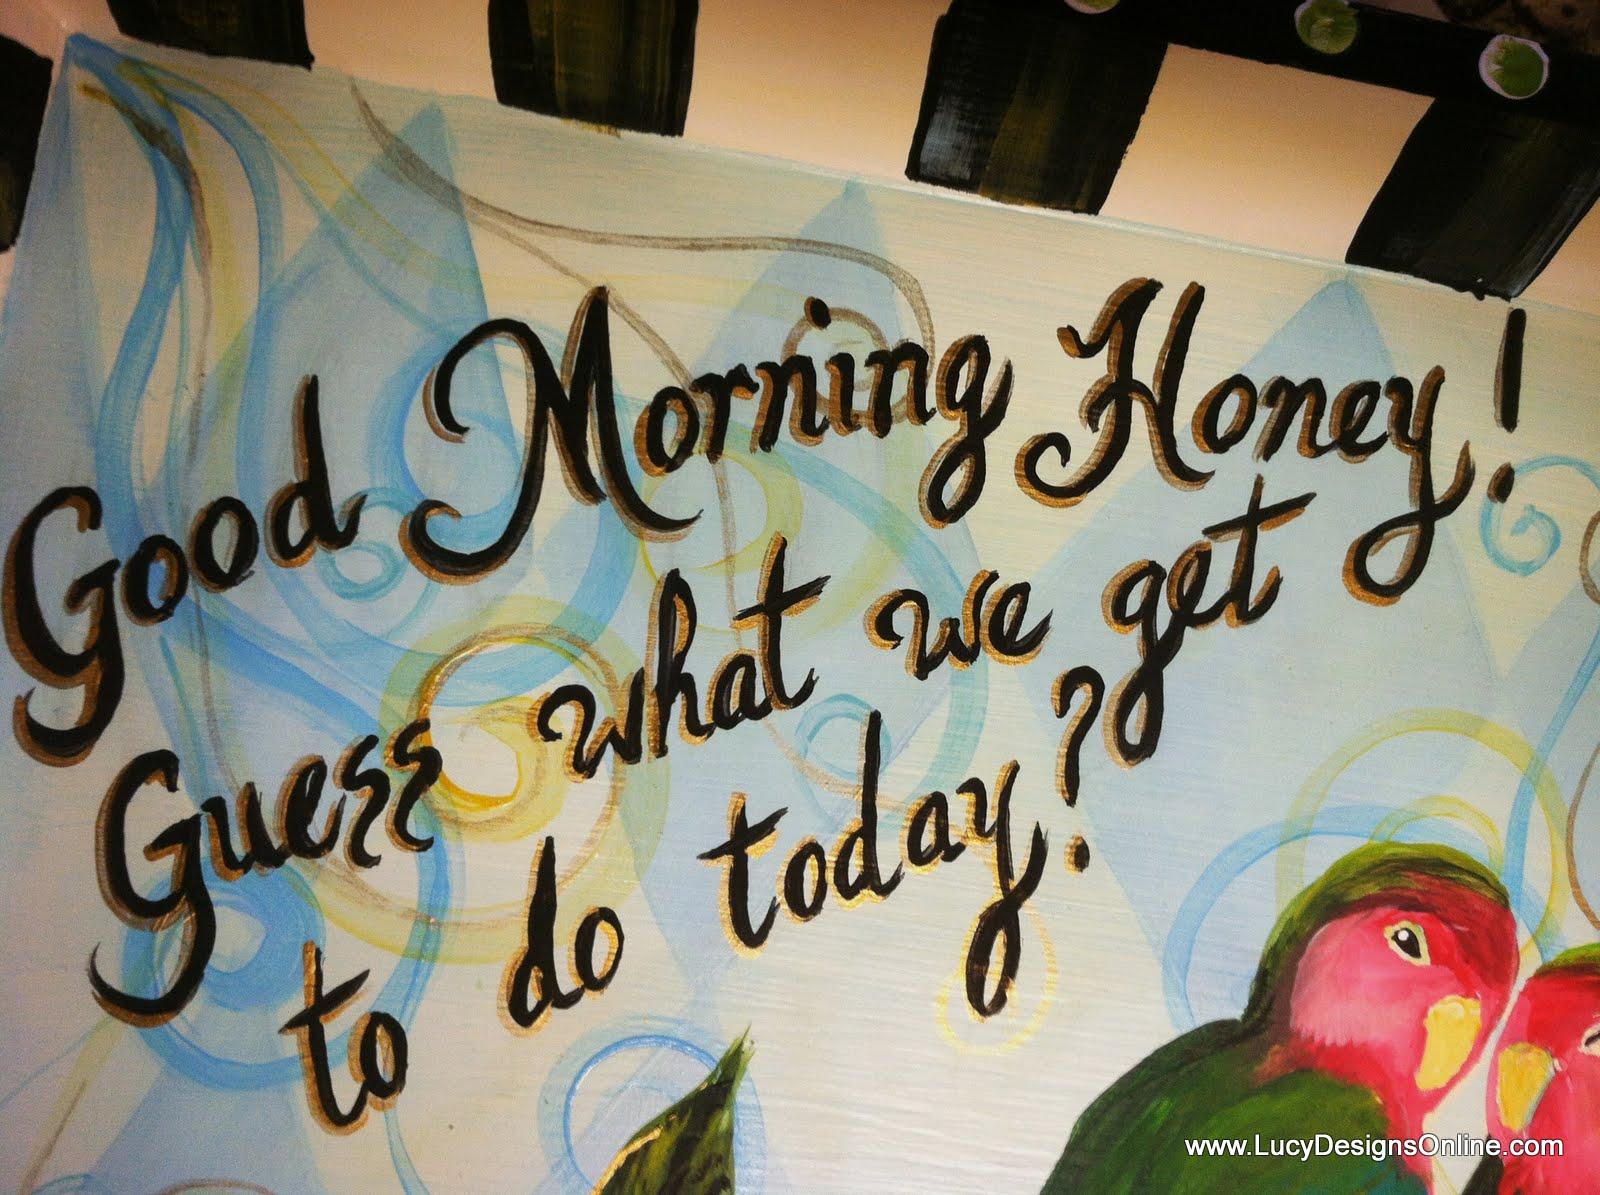 Good Morning Honey Artinya : Good morning honey quotes quotesgram